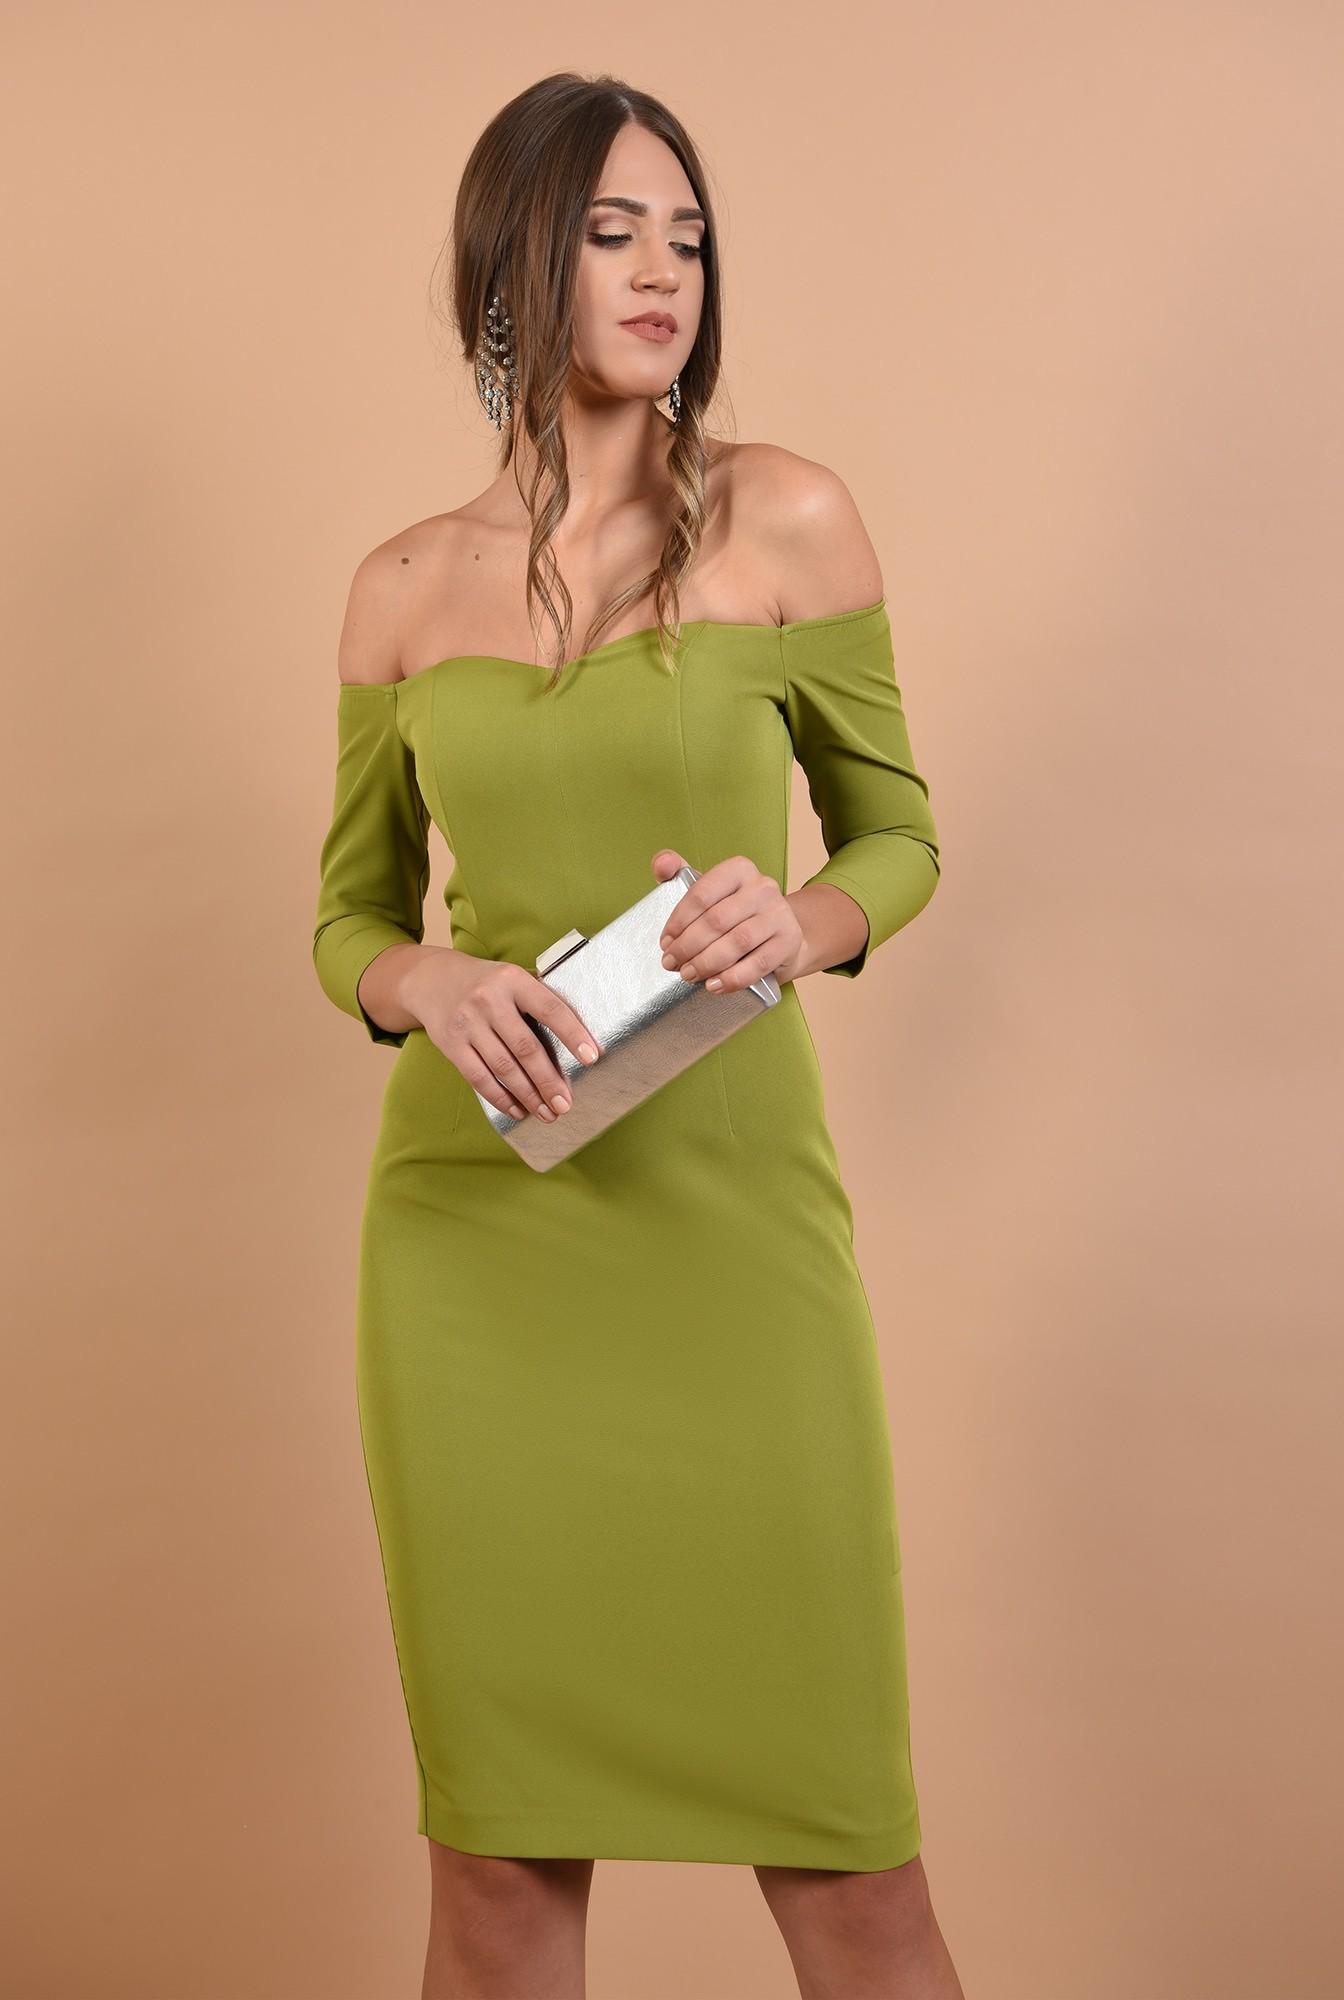 rochie Poema, eleganta, cambrata, cu maneci ajustate, verde lime